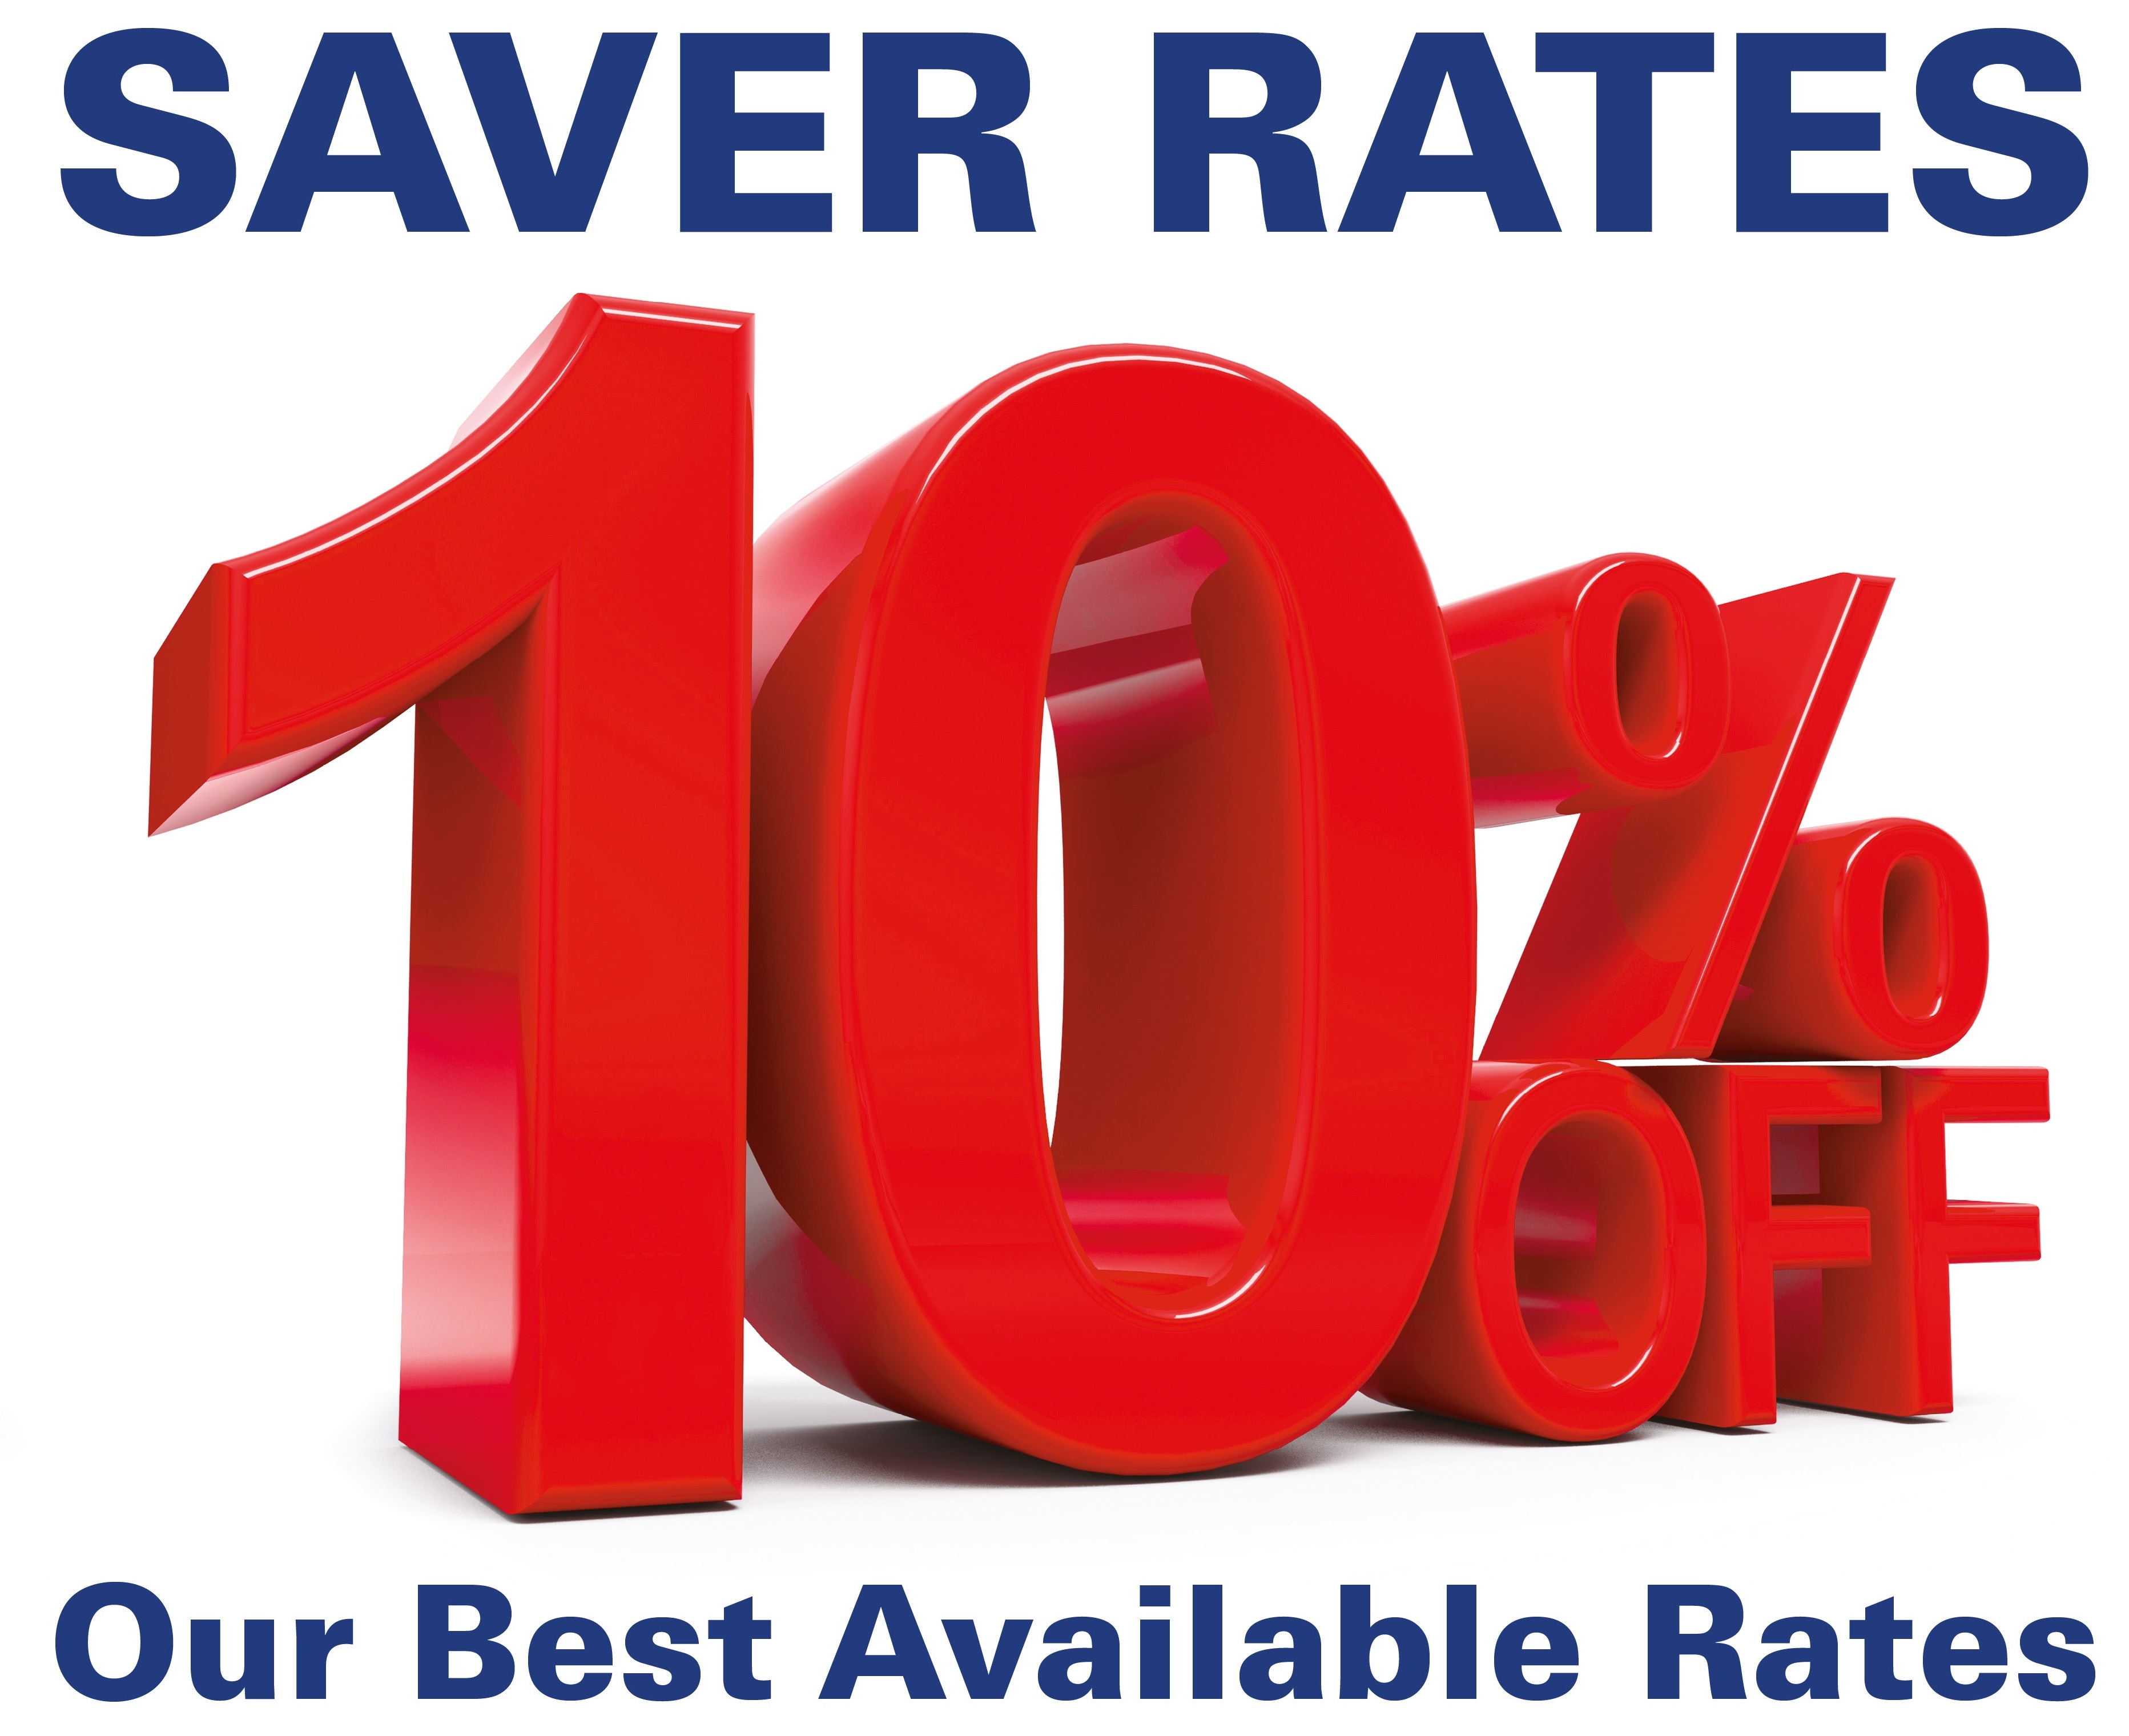 Wembley hotel Saver Rates